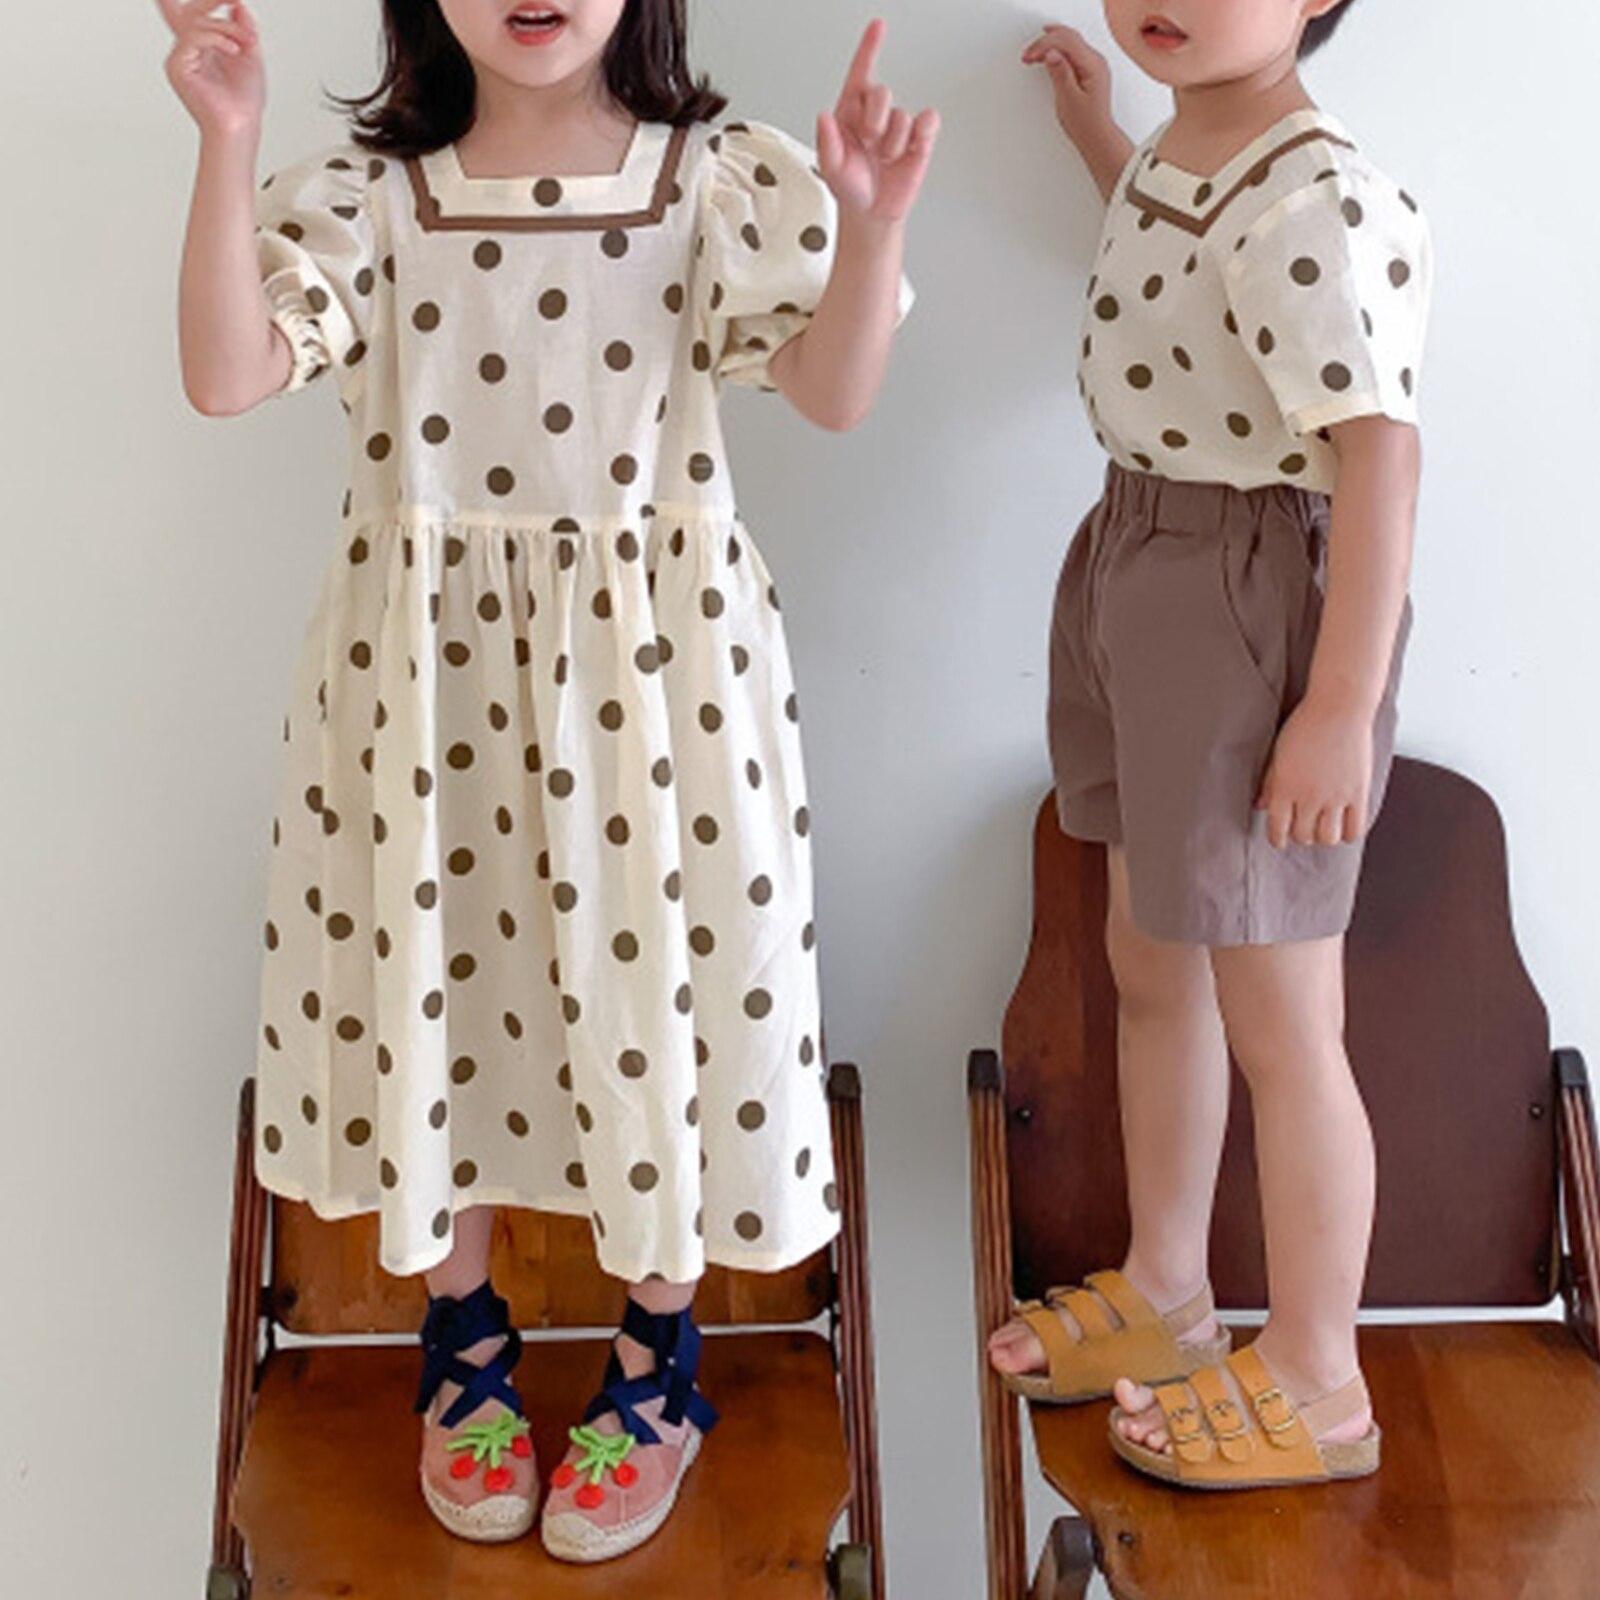 Brother ملابس شقيقة 2021 ملابس صيفية طفل بنين قطعتين دعوى دوت طباعة بنات فستان قطن موضة التوائم ملابس وتتسابق